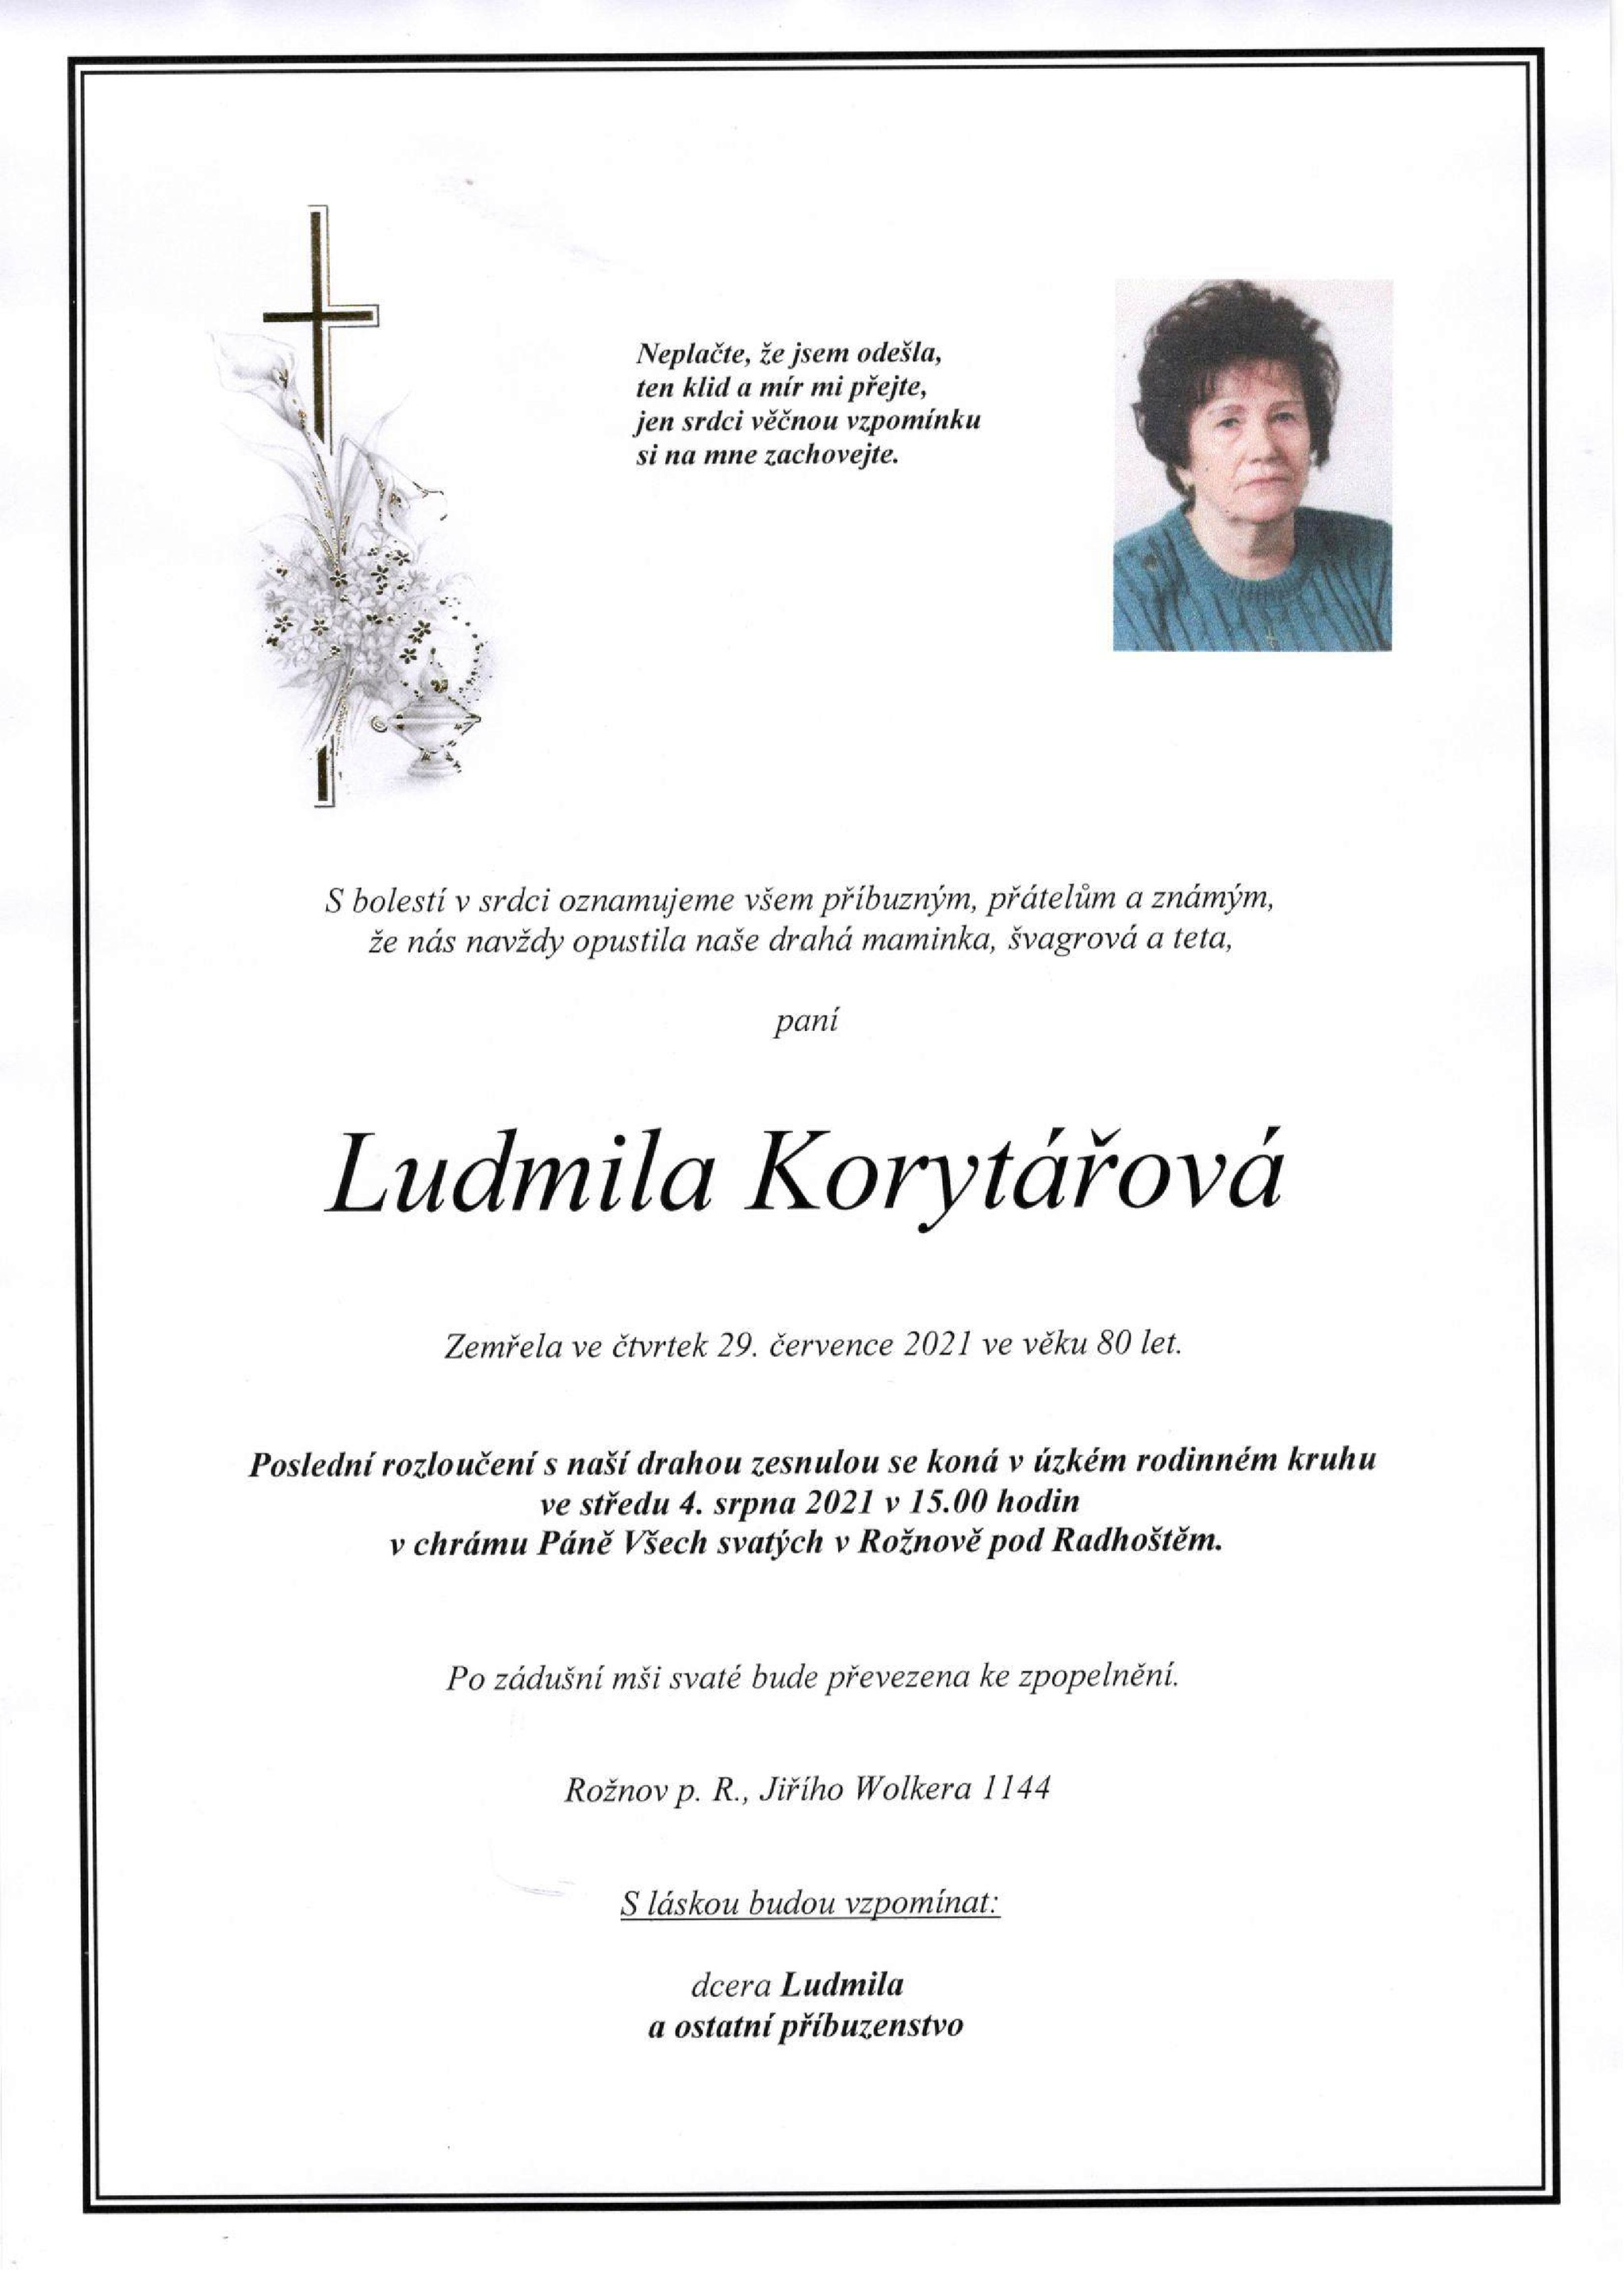 Ludmila Korytářová